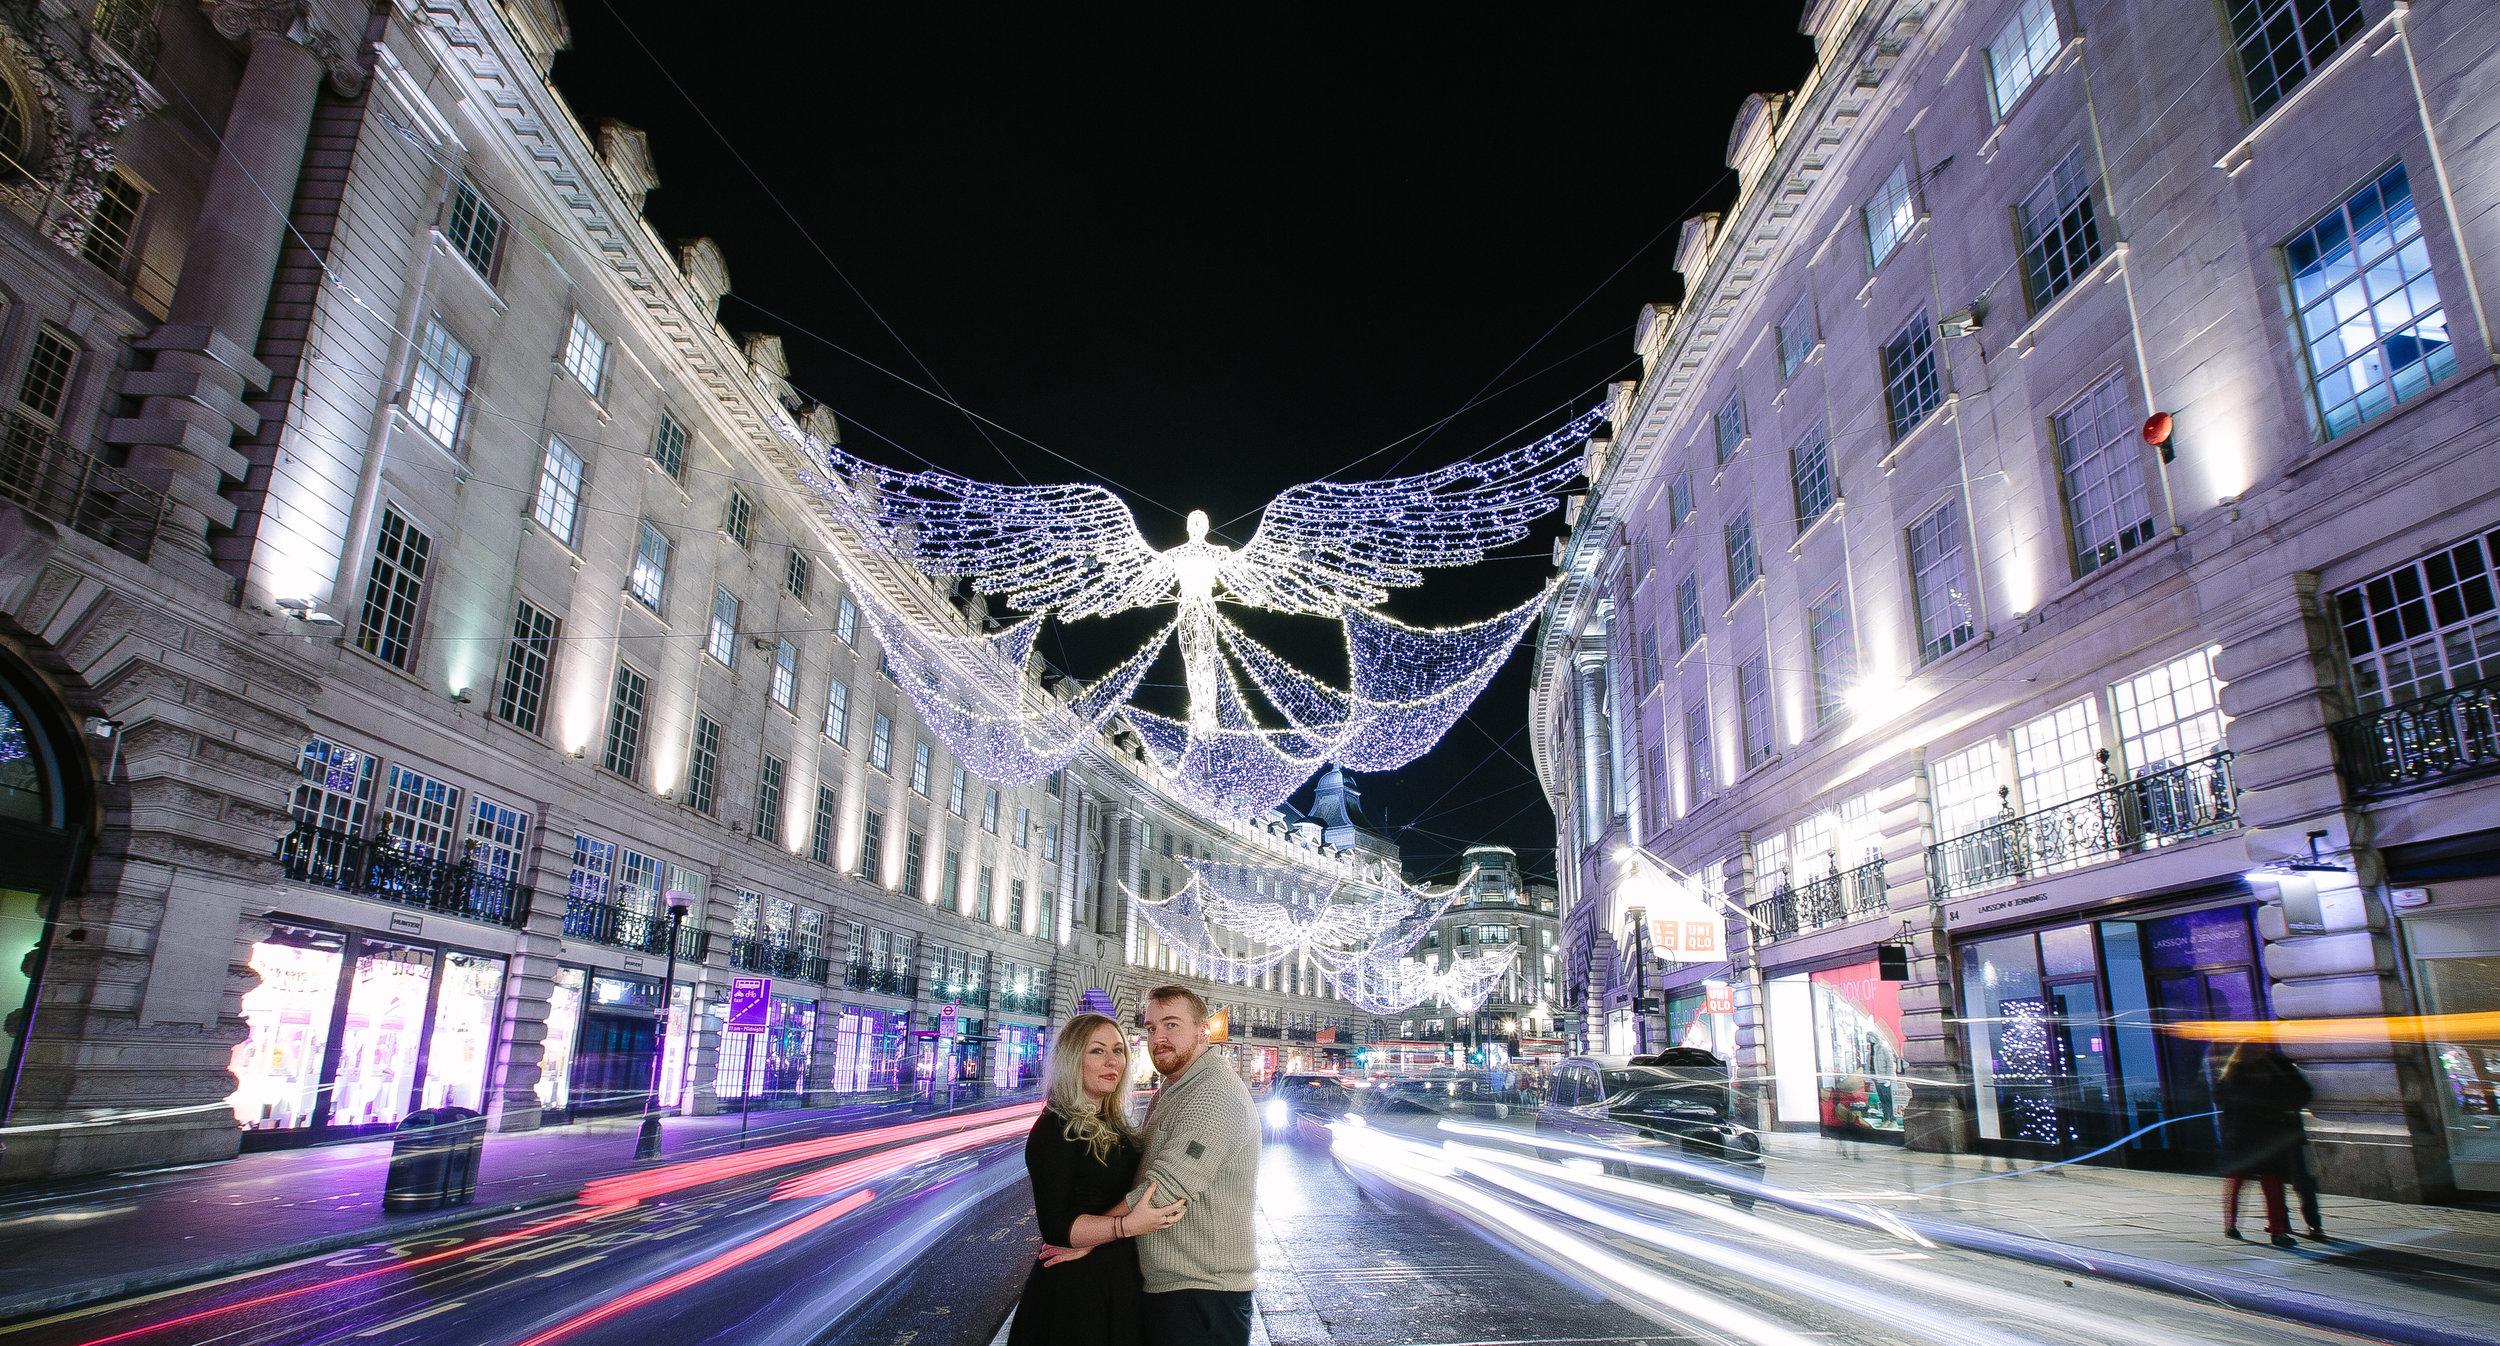 london-oxford-street-christmas-lights-engagement-wedding-photography-01